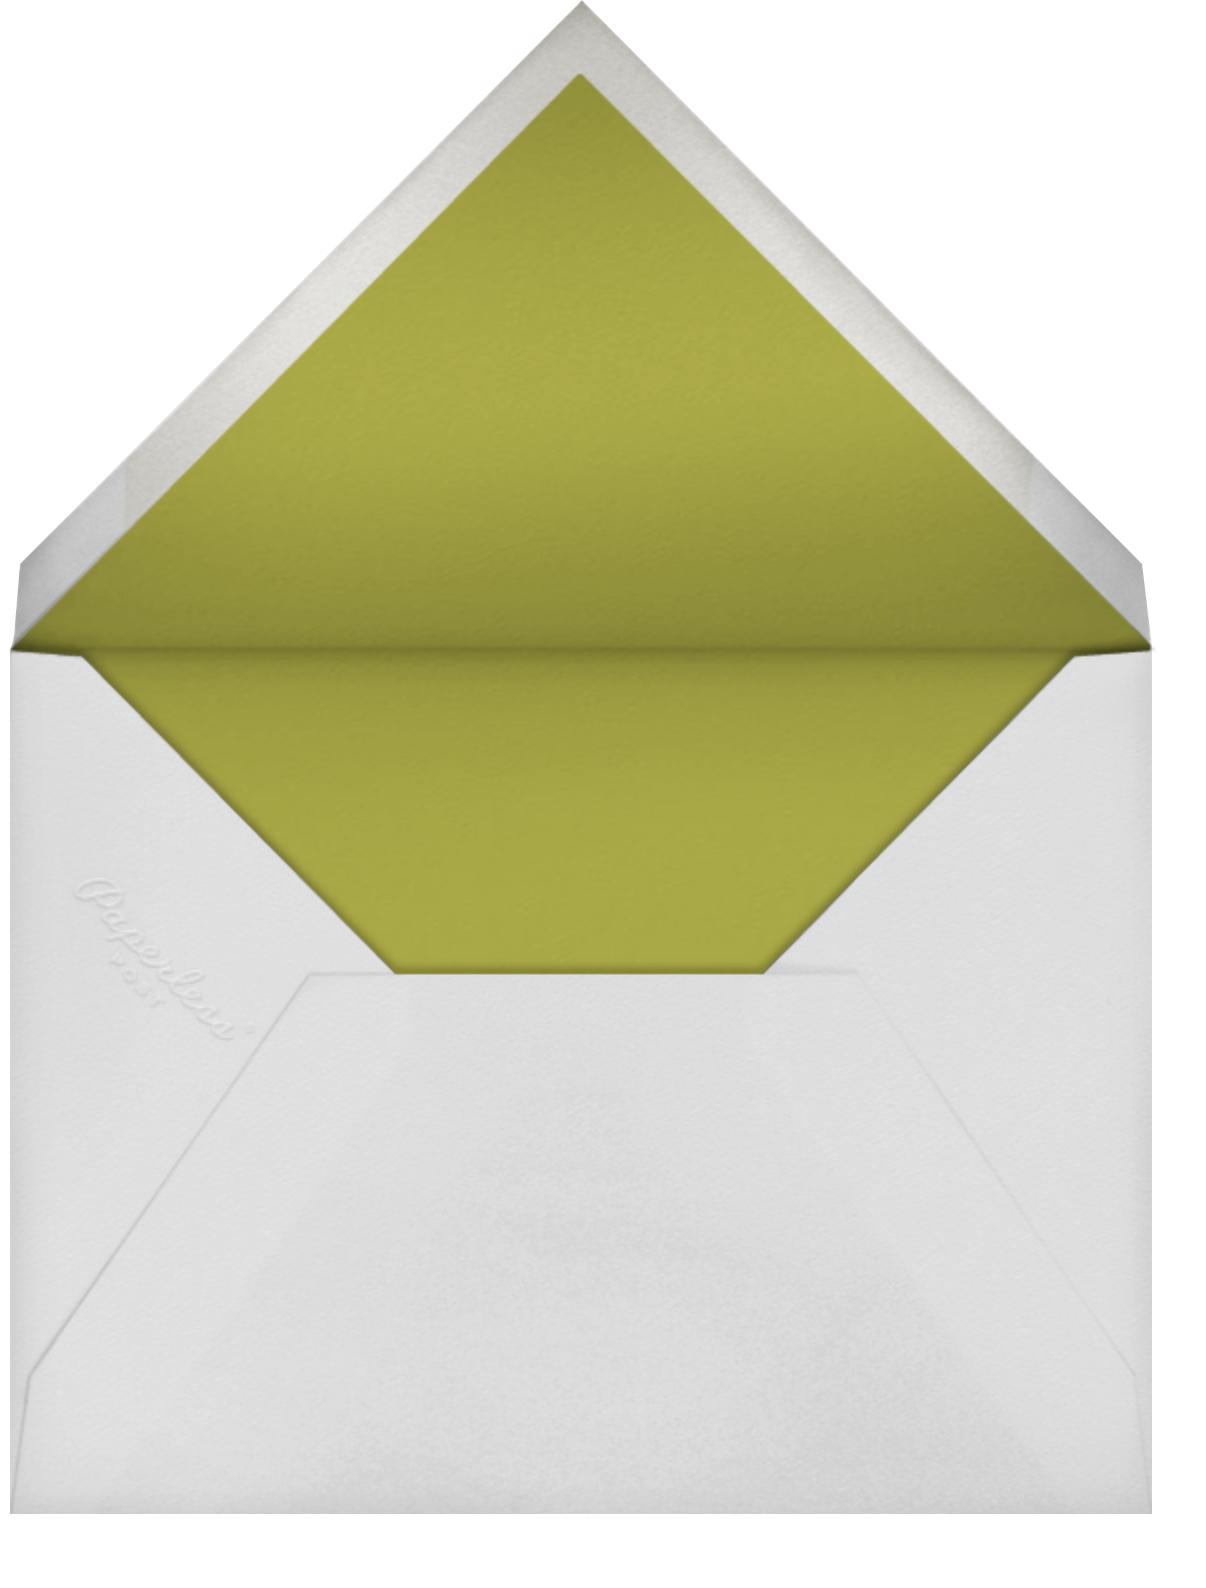 Gradient Messy Strokes - Green - Paperless Post - Bridal shower - envelope back